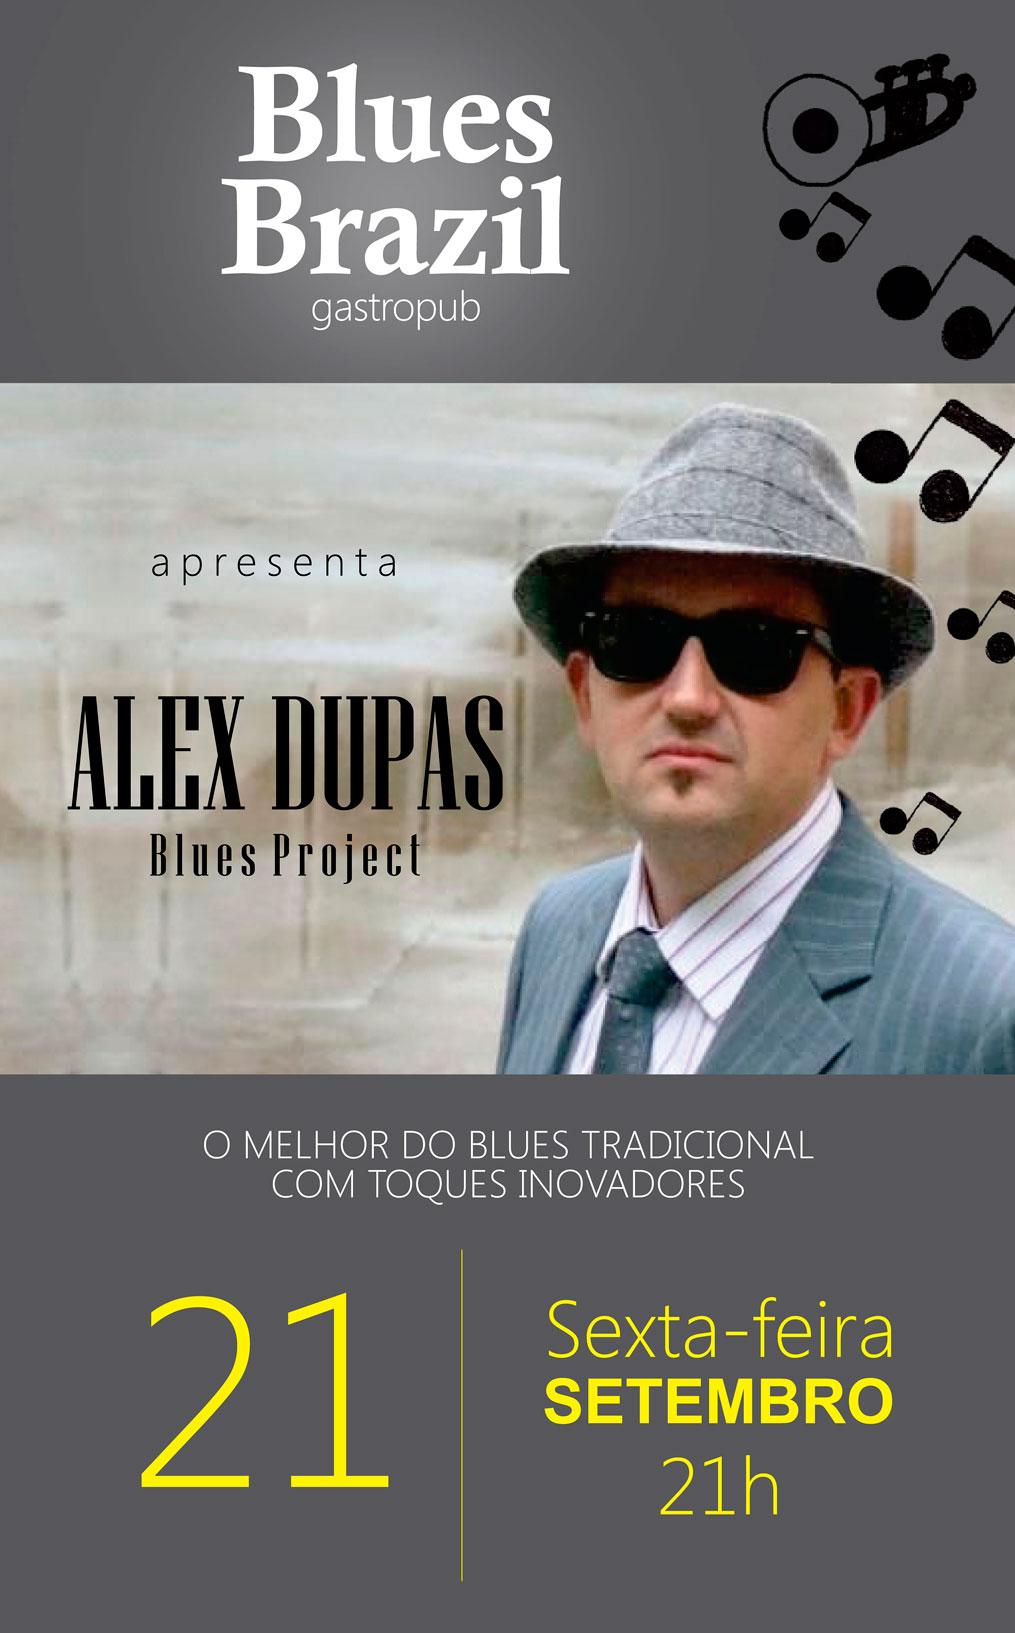 Blues Brazil 21-09-2012